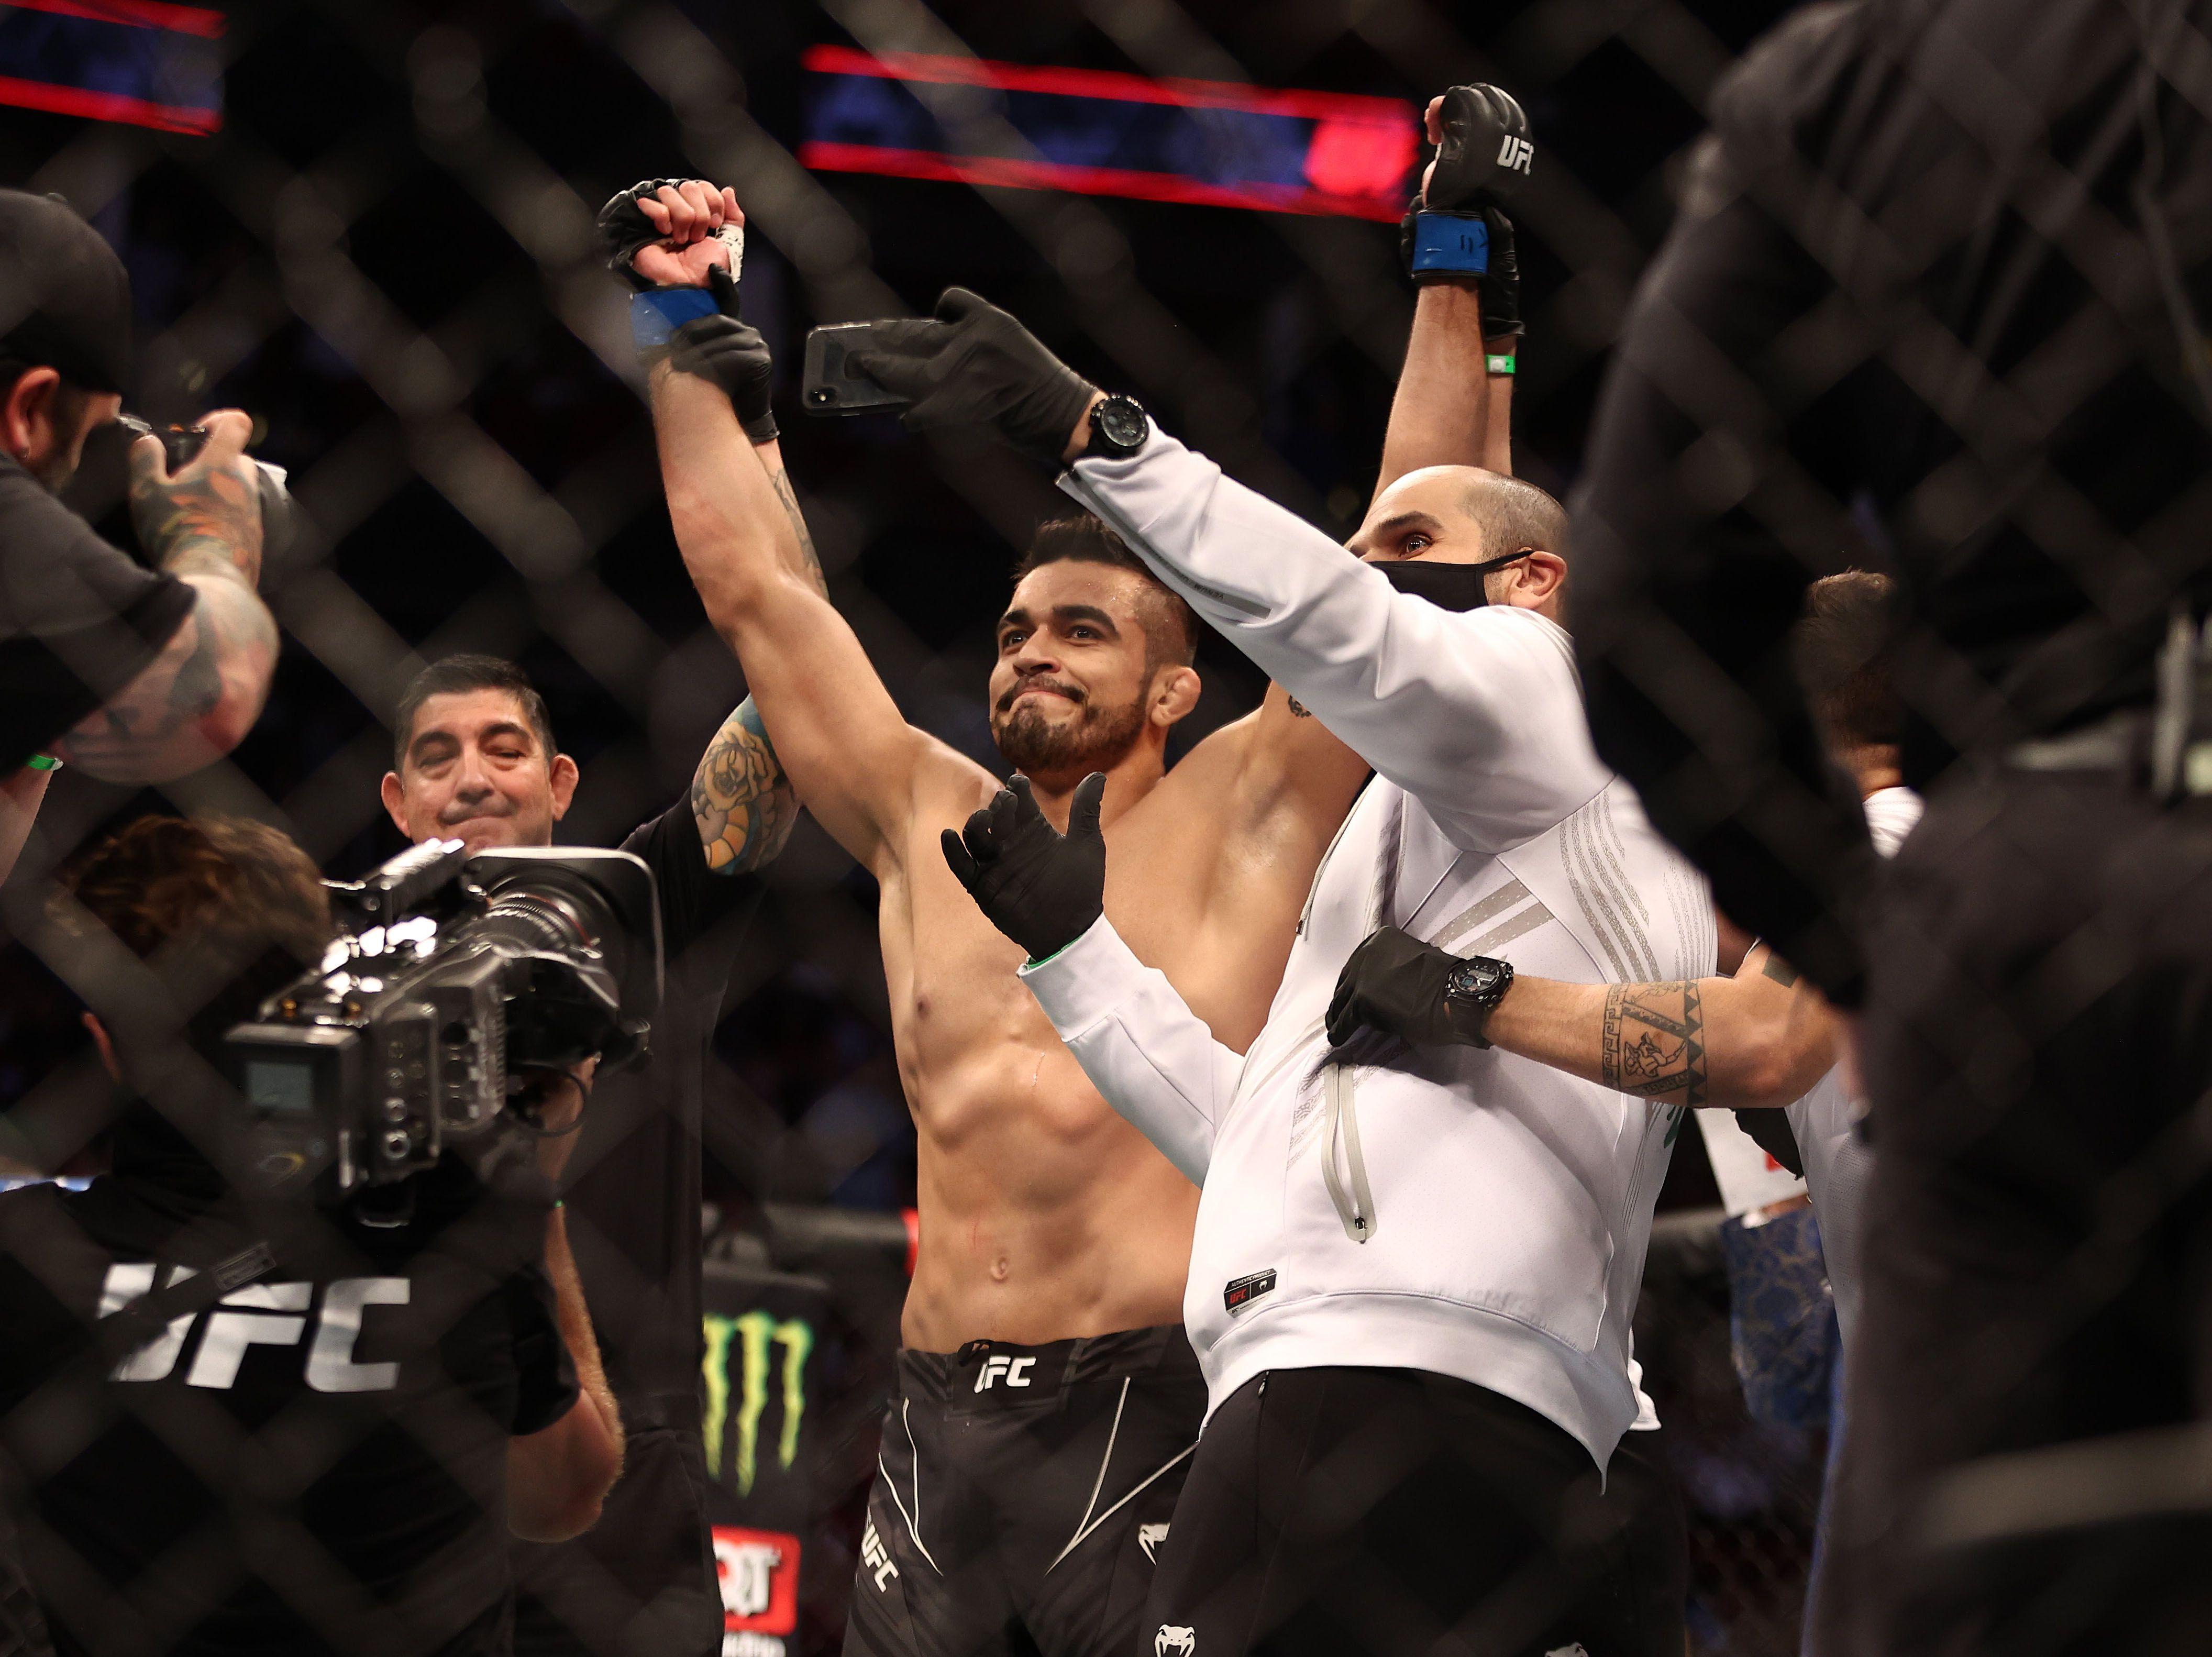 André Muniz se alzó con la victoria en el UFC 262 (Usa Today Sports)